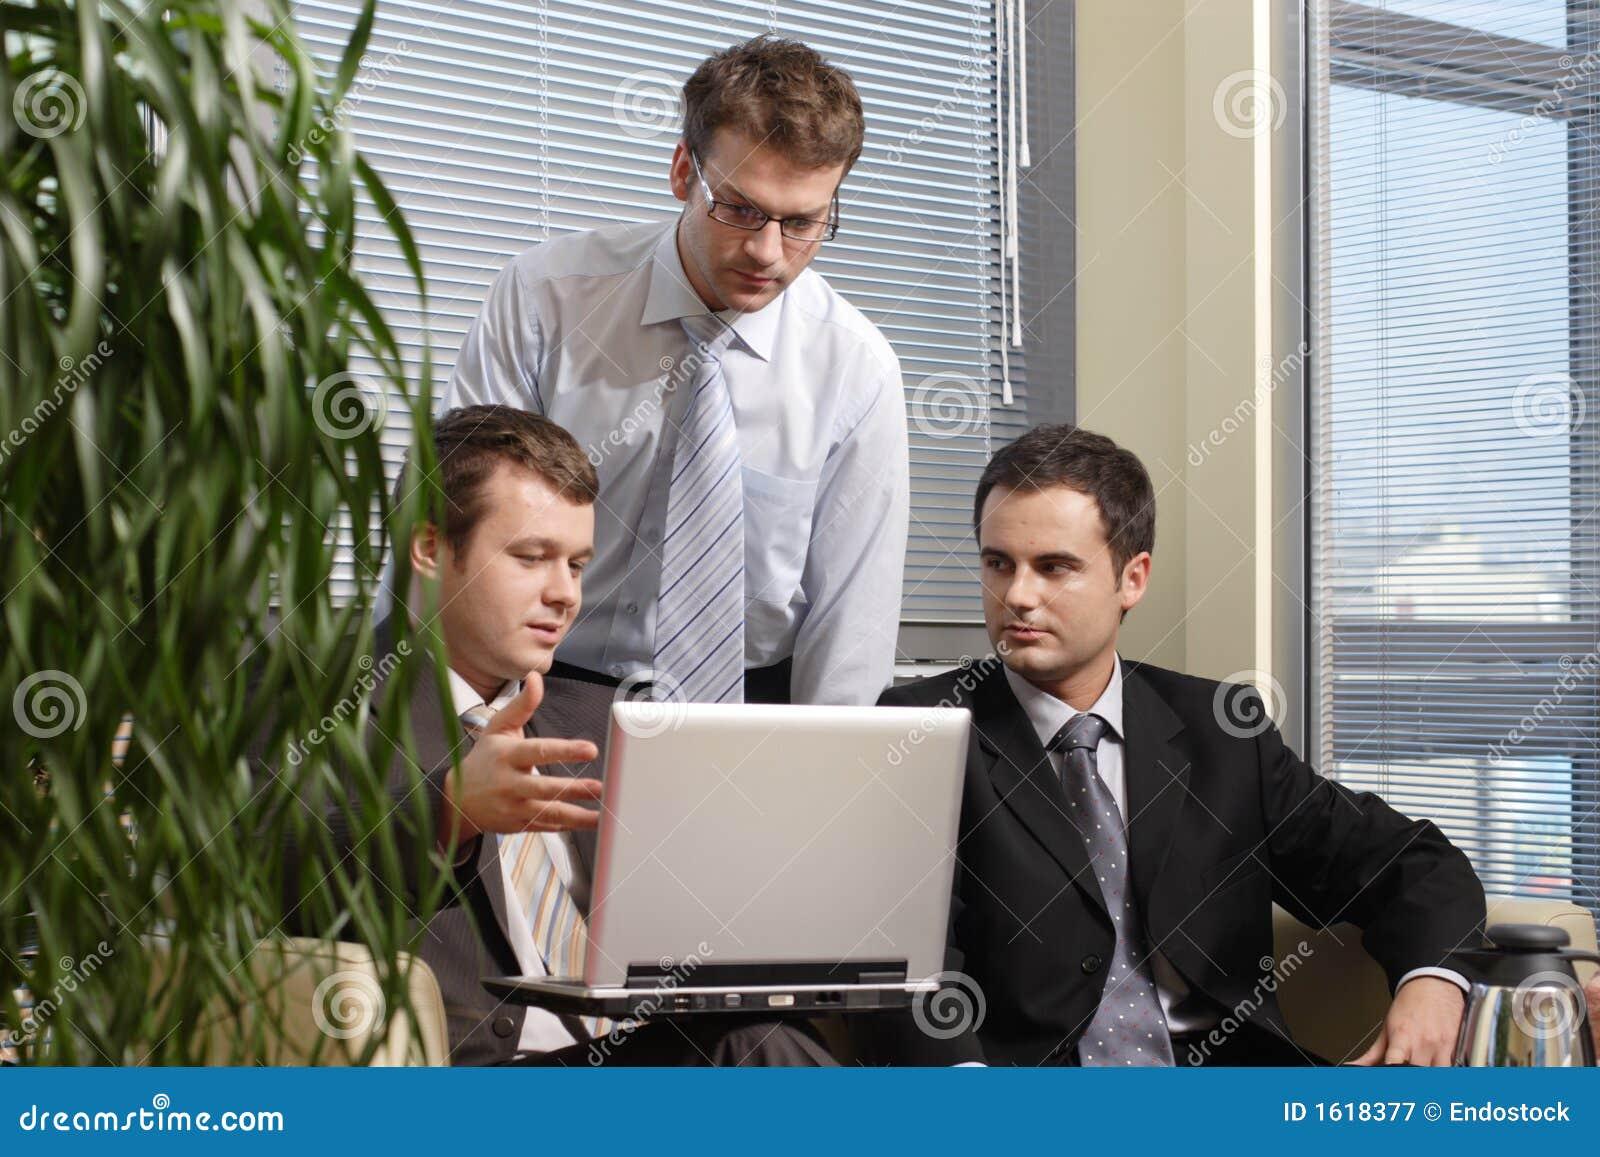 фото люди в офисе